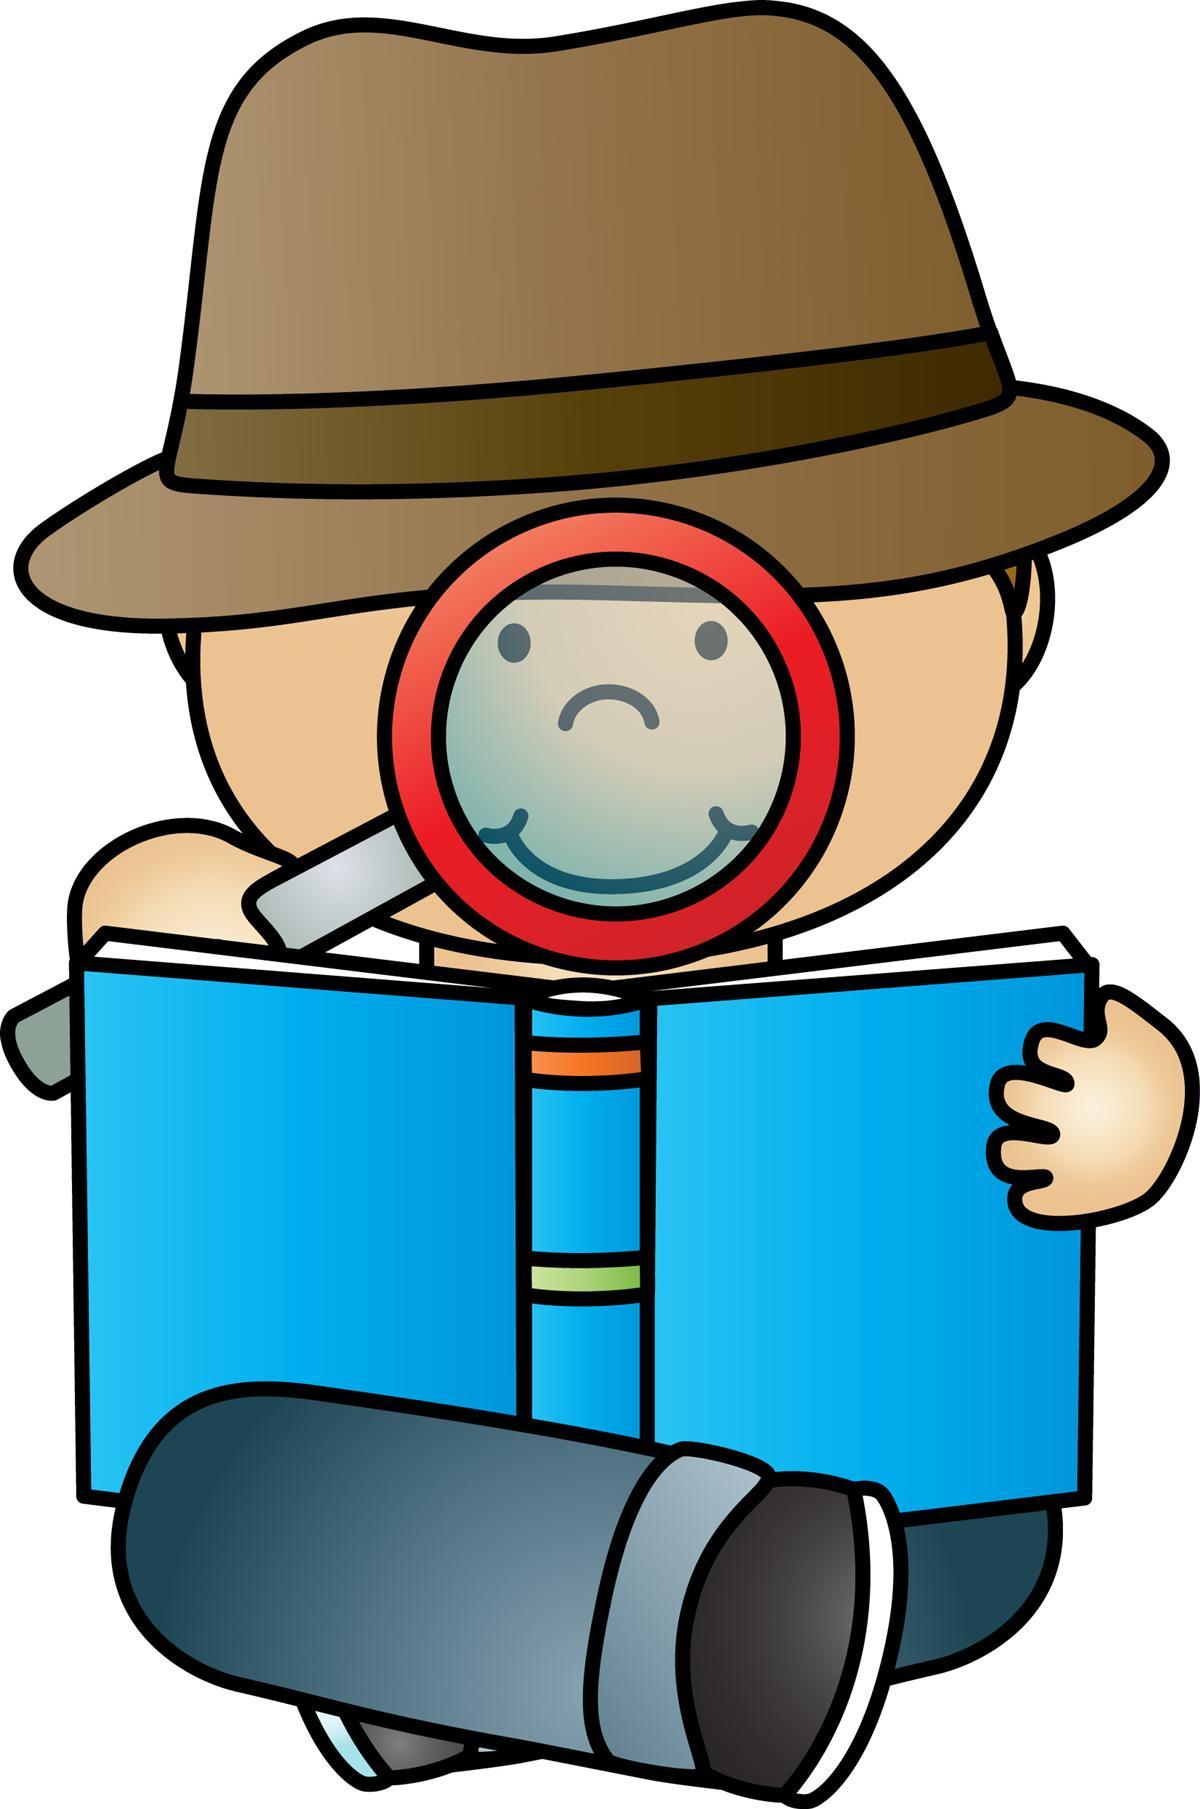 Evidence Clipart Clue Evidence Clue Transparent Free For